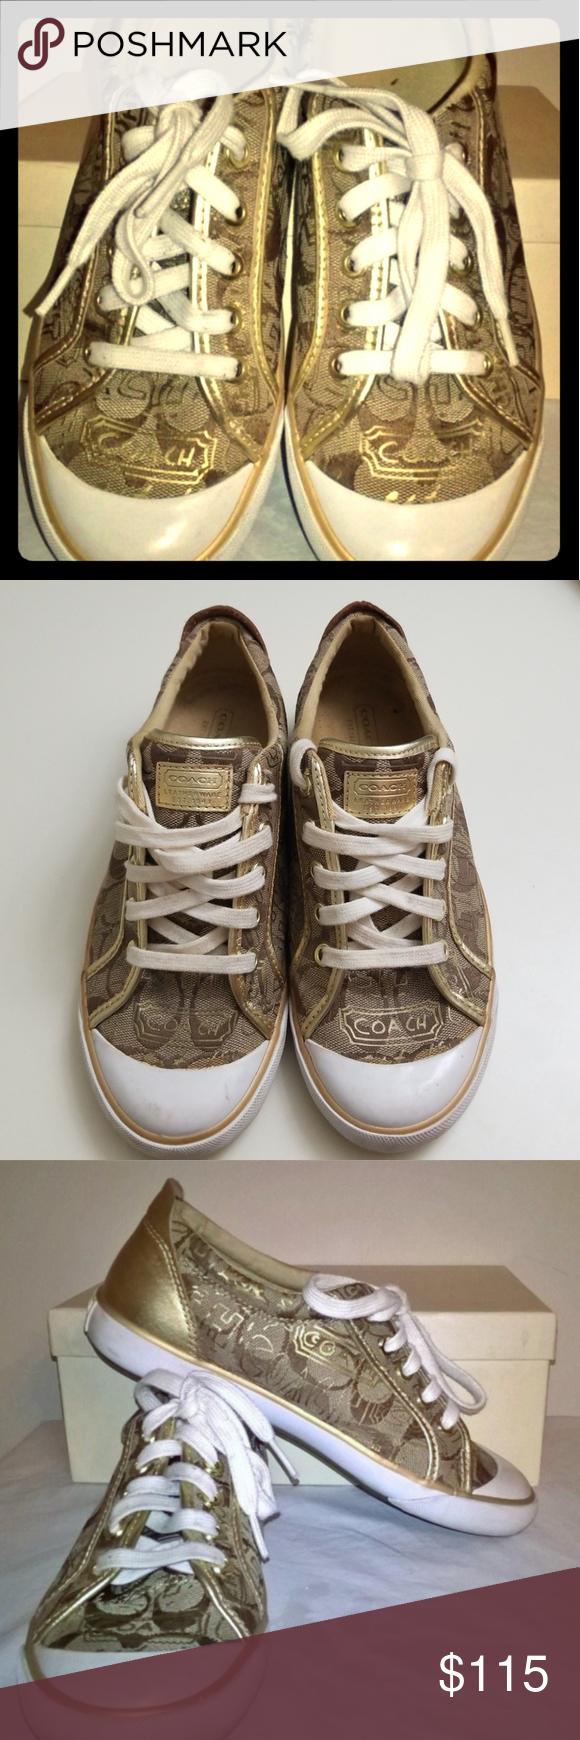 eb6ad59a0ec Coach Barrett Graffiti Tennis Shoes Gold Brown White    Some Scuffs    Worn  Once Coach Shoes Sneakers